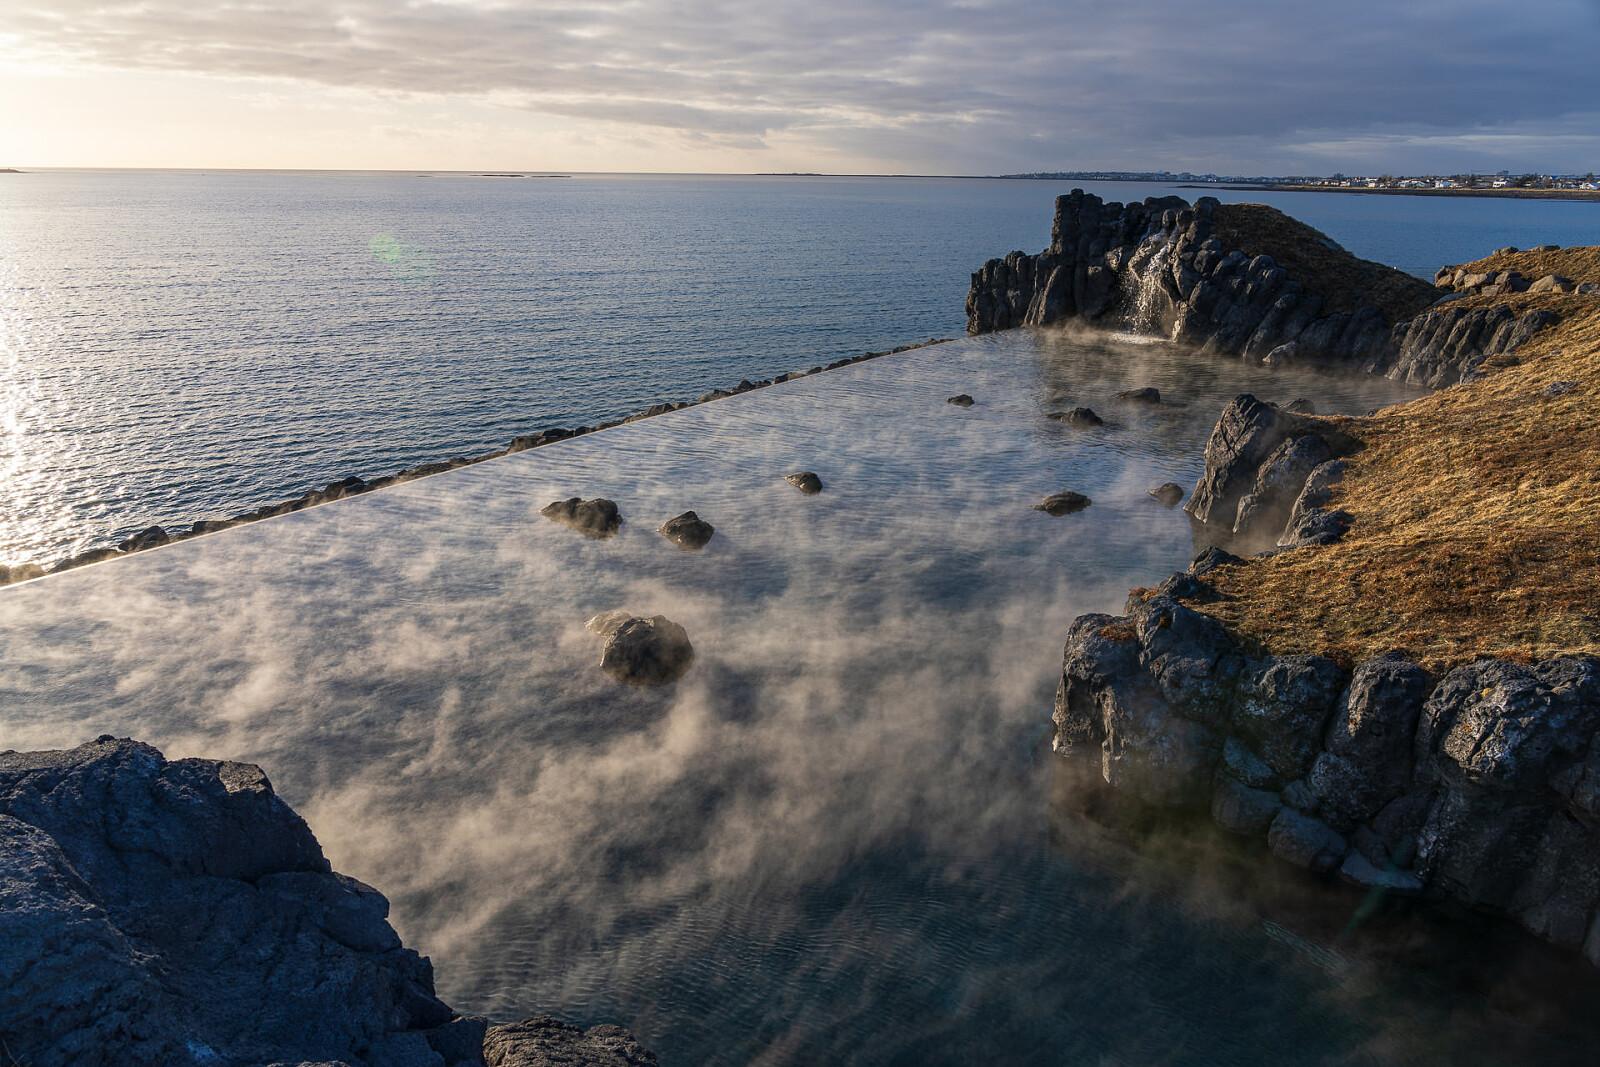 fot. Christopher Lund / materiały prasowe Sky Lagoon